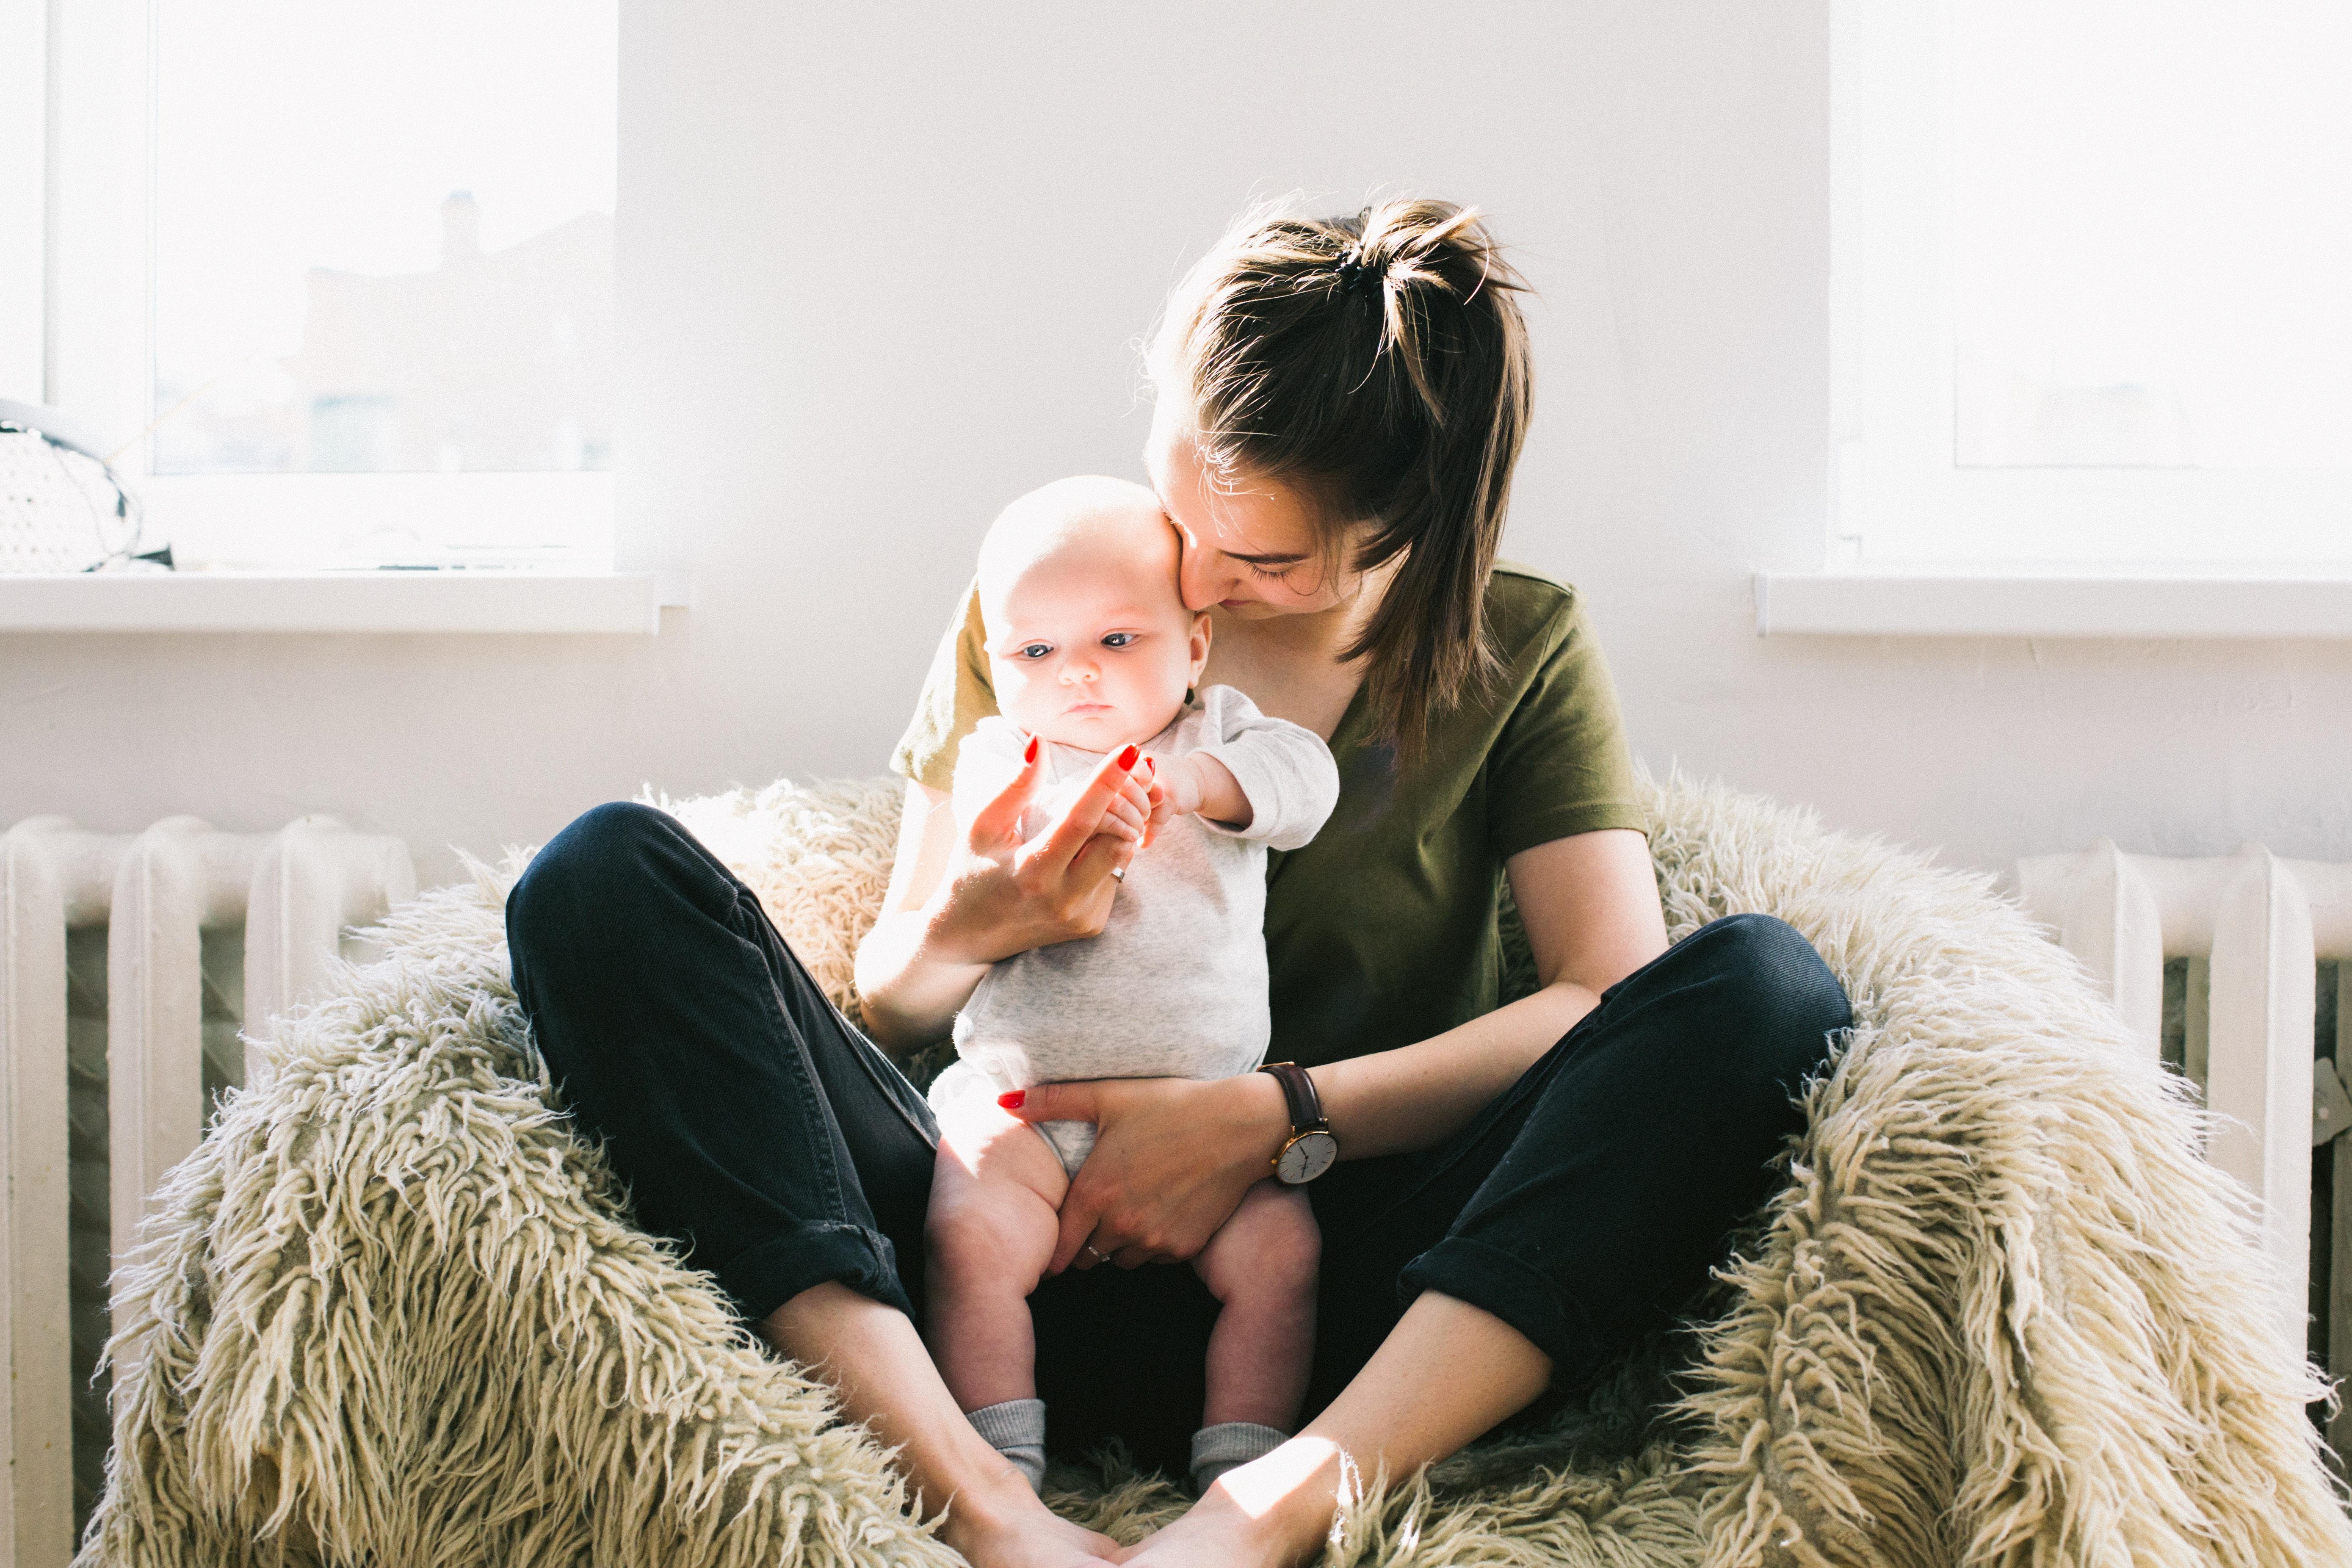 adult-baby-babysitter-698878